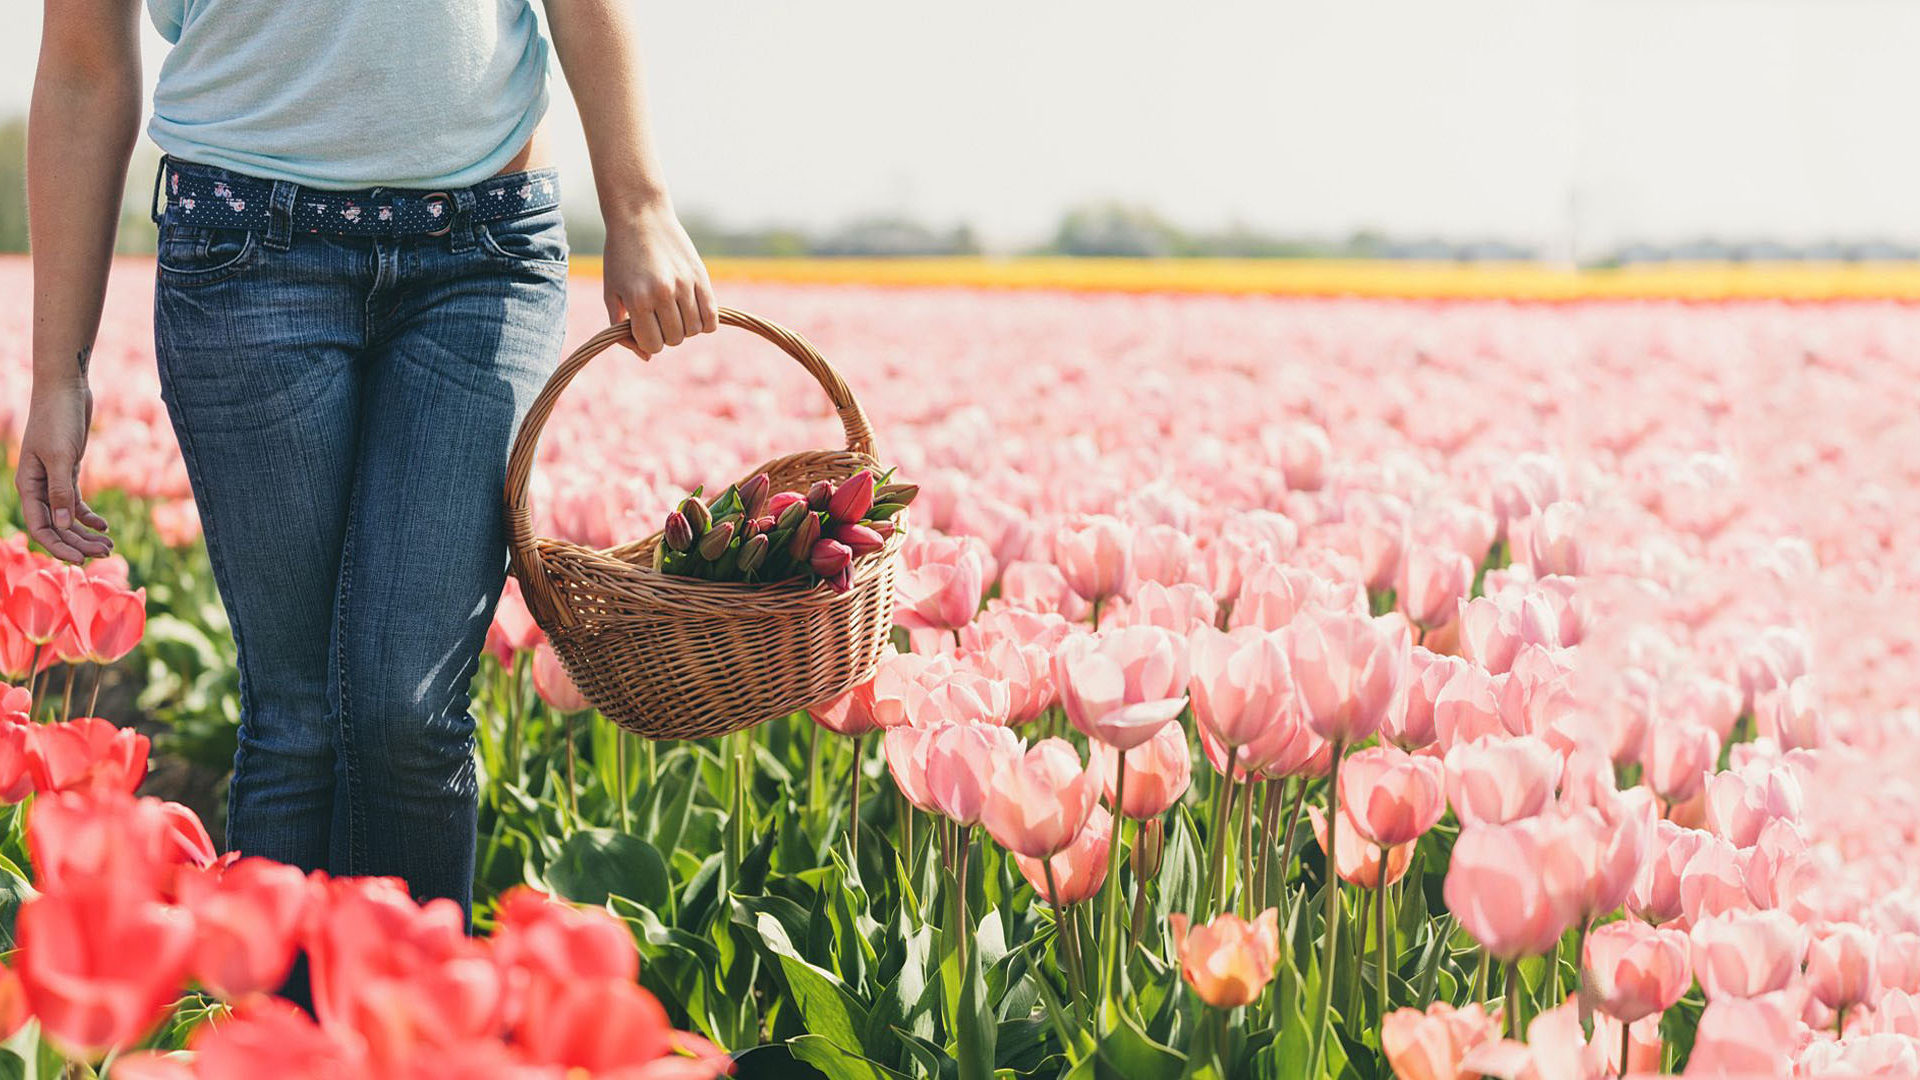 Permalink to: 300.000 Tulipani da raccogliere